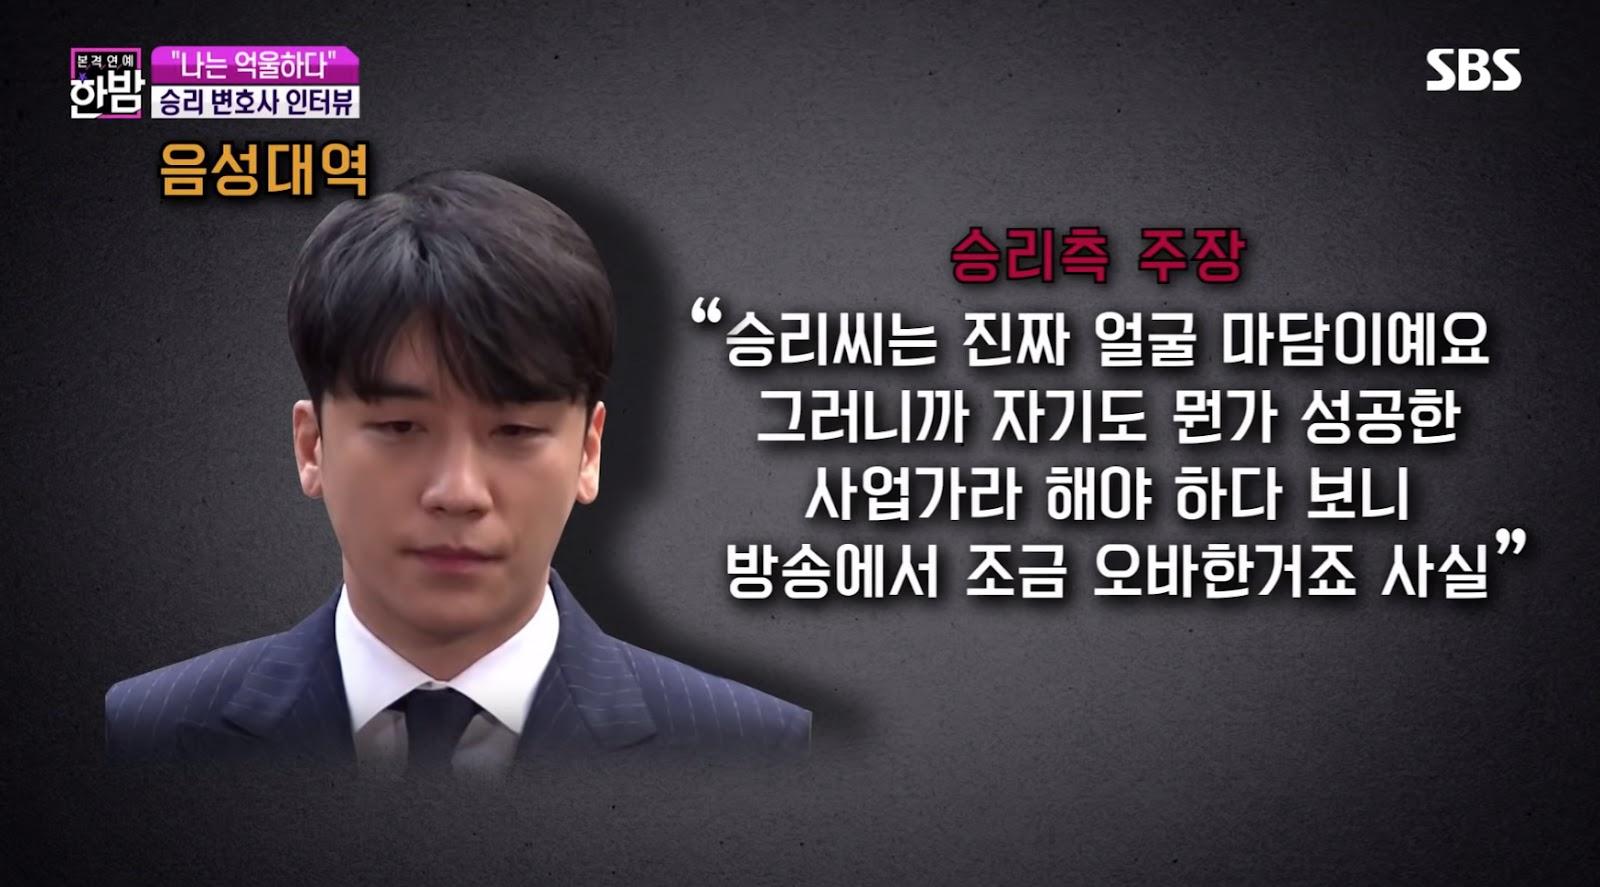 seungri lawyer denial 4